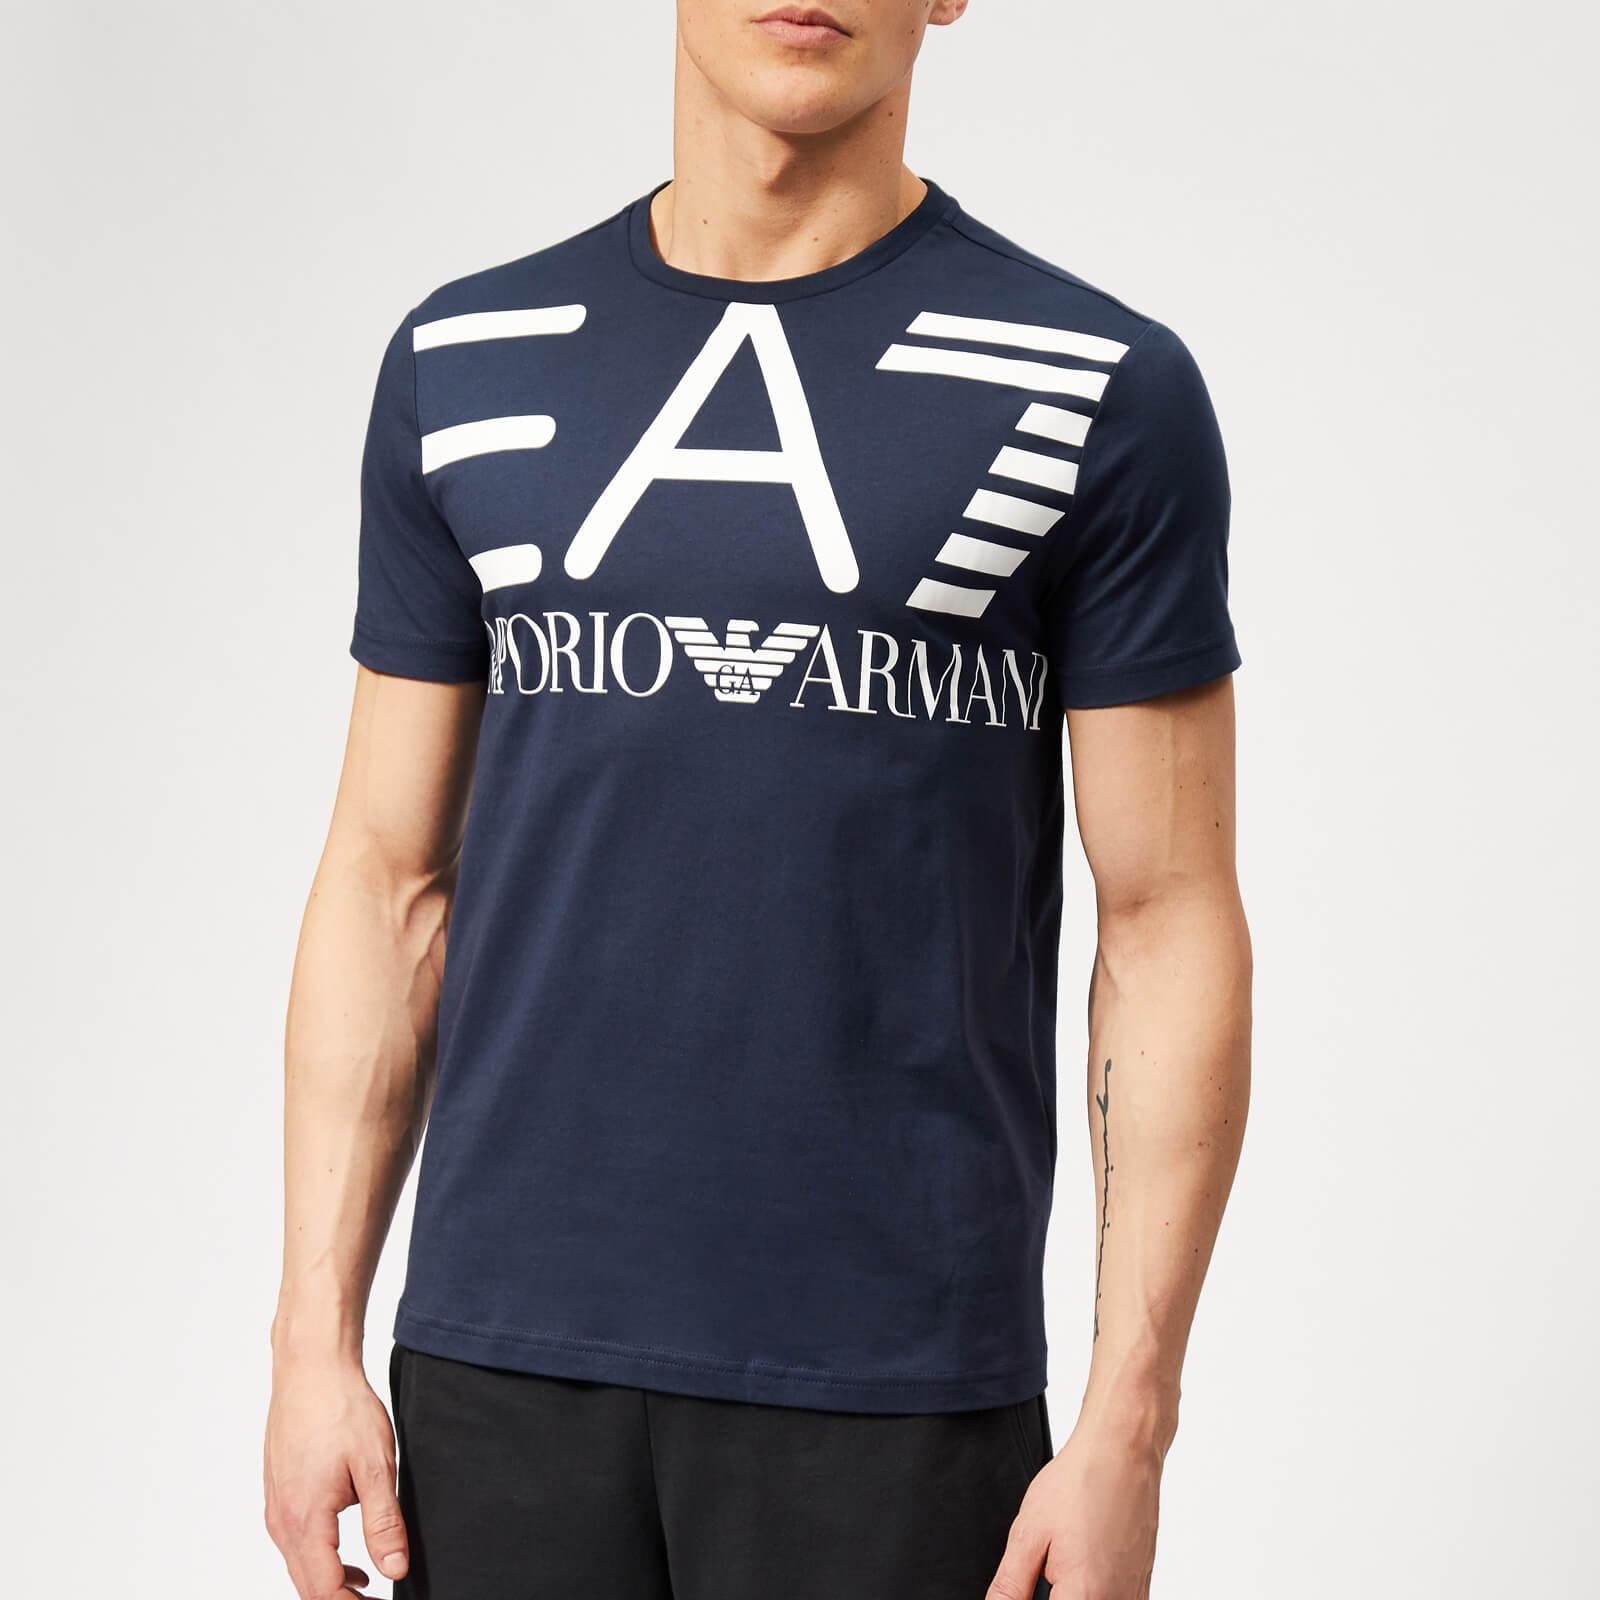 0ceafa08 Emporio Armani EA7 Men's Train Logo Series Oversize Logo Short Sleeve T- Shirt - Navy Blue Clothing | TheHut.com